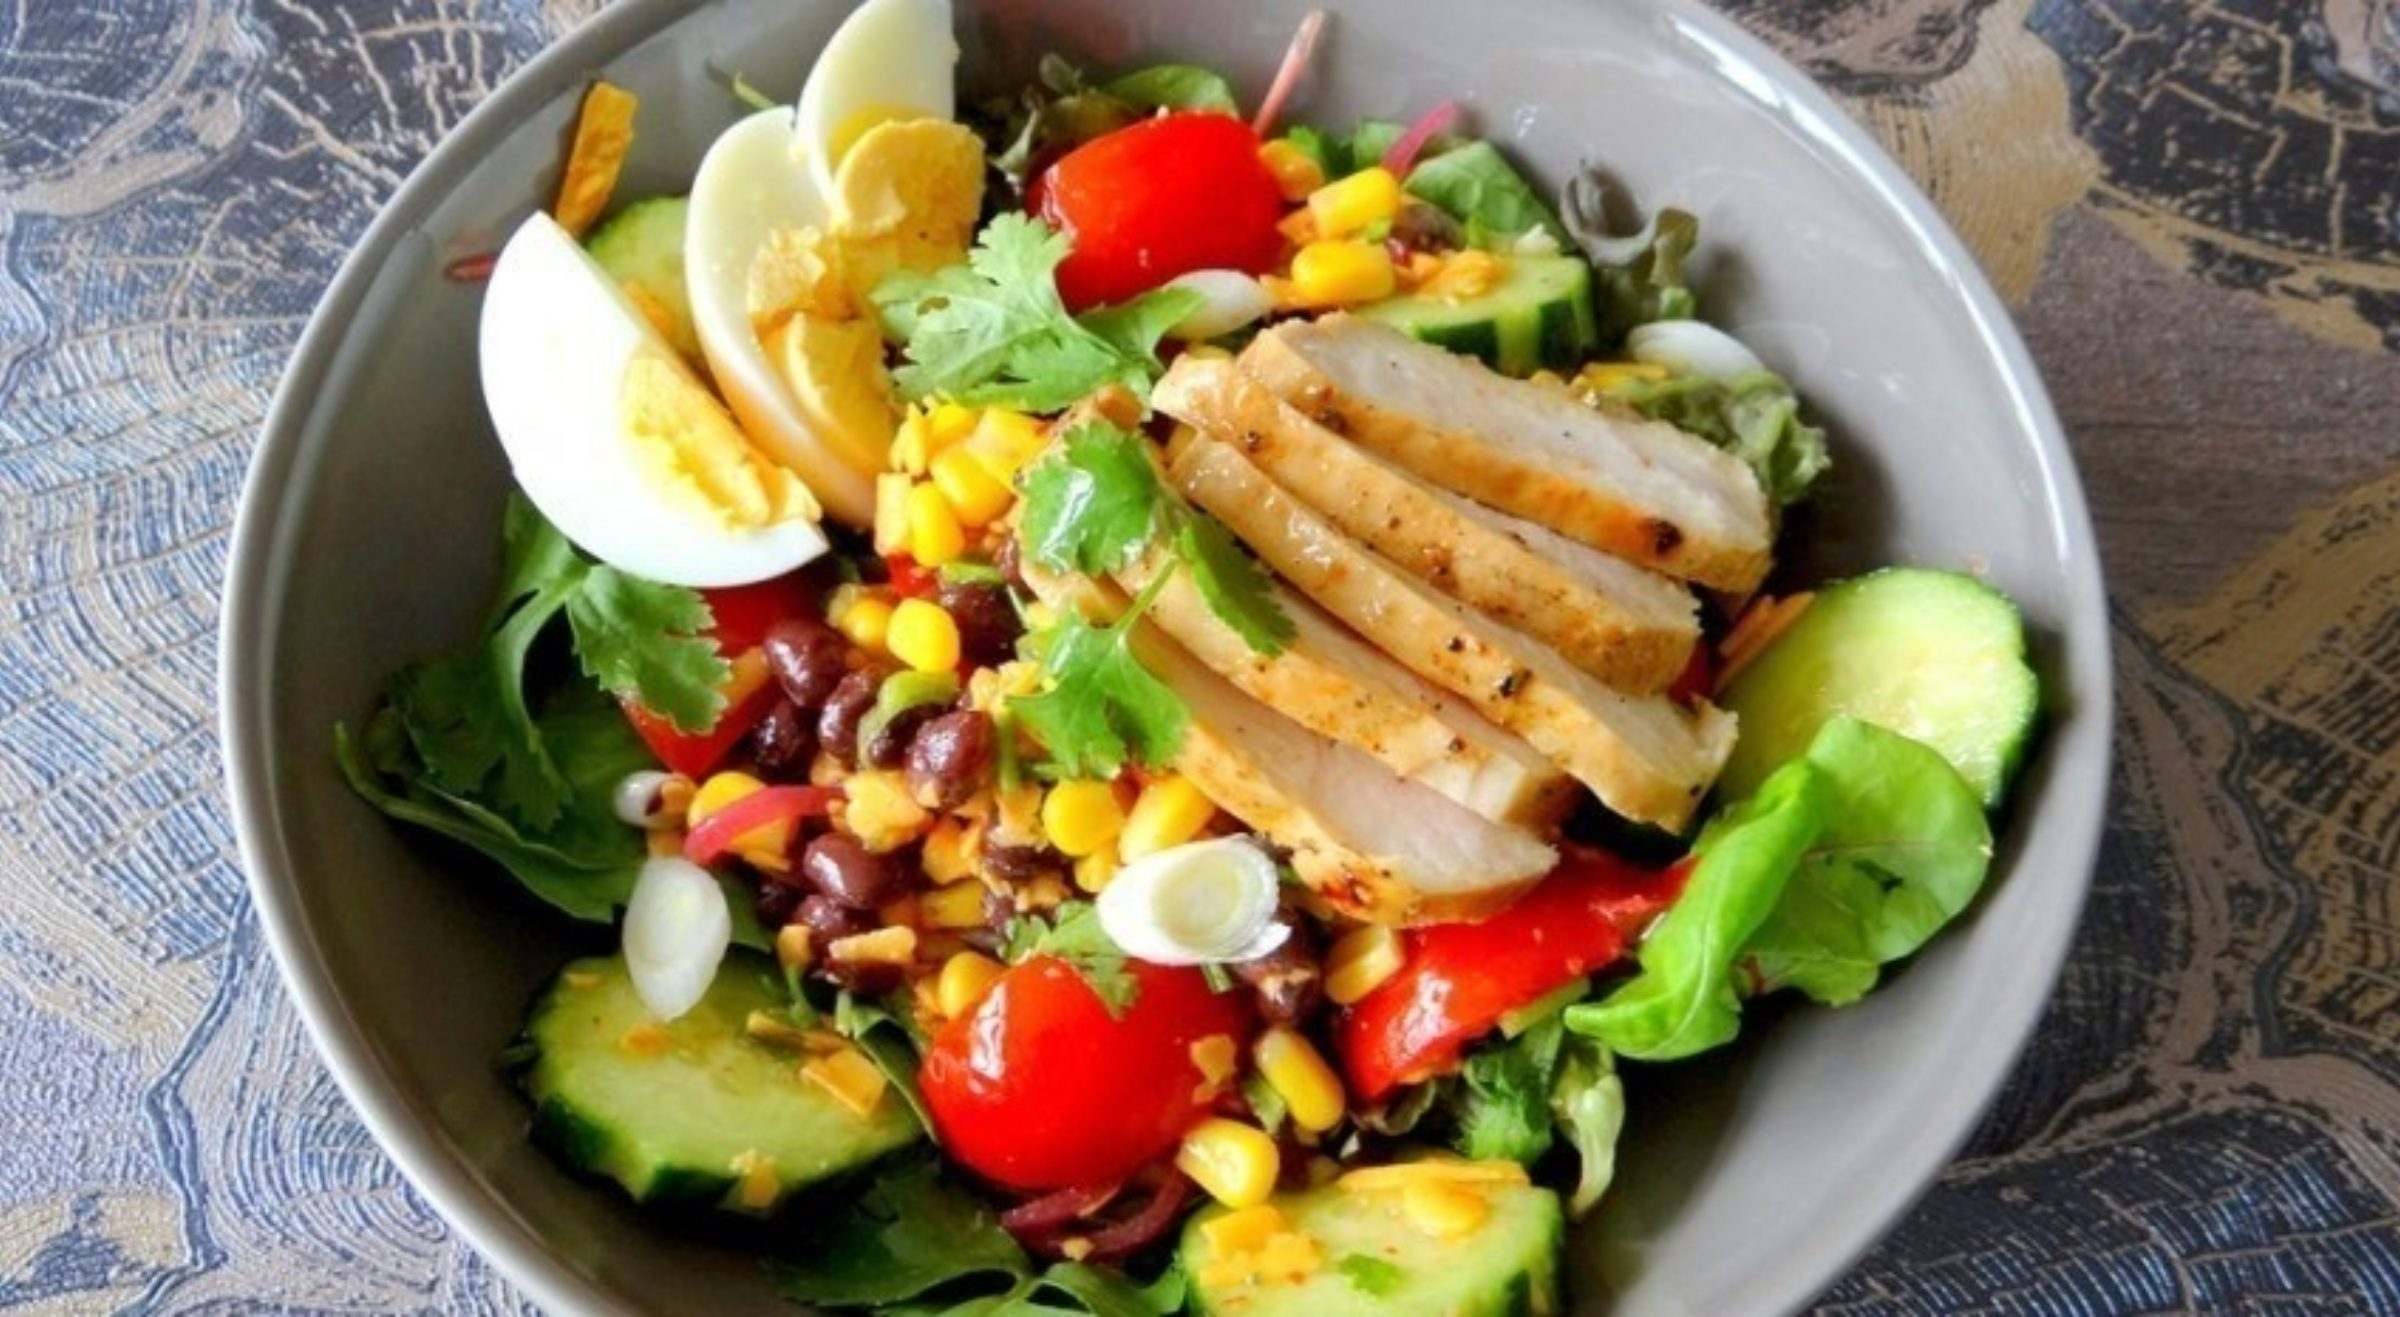 Saladee 447 1523528026 35hsumkao4